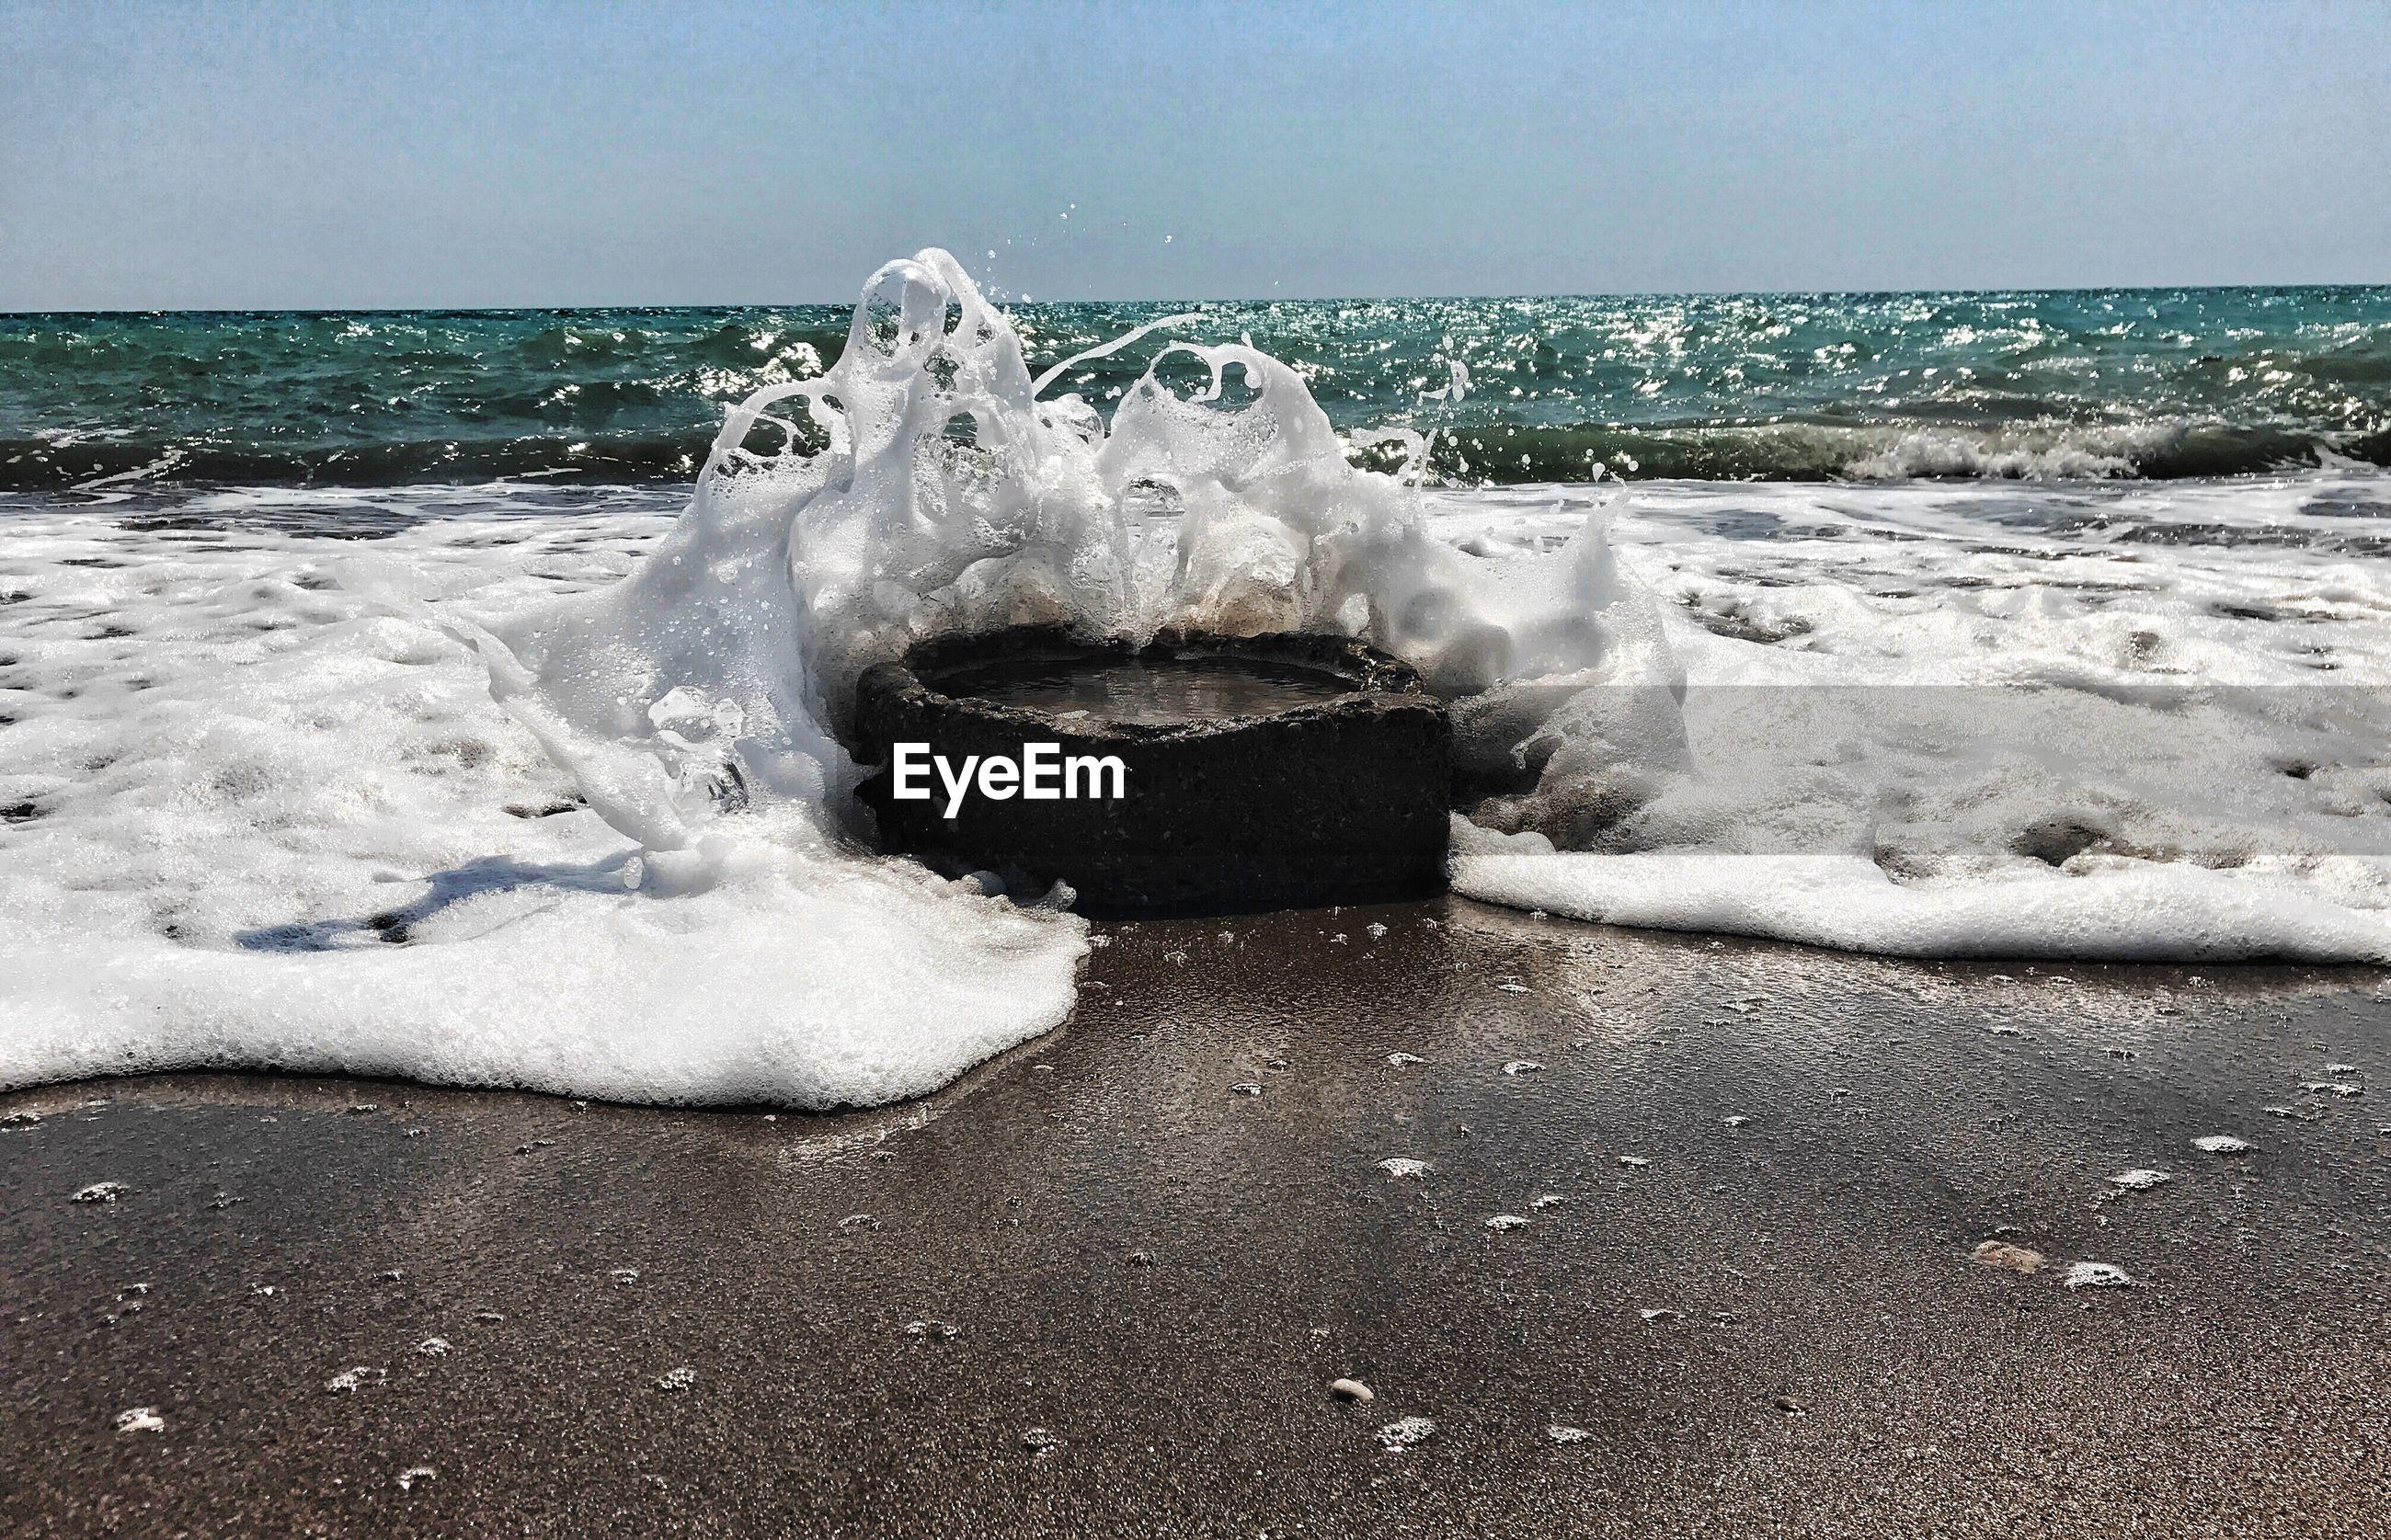 WAVES BREAKING ON BEACH AGAINST CLEAR SKY